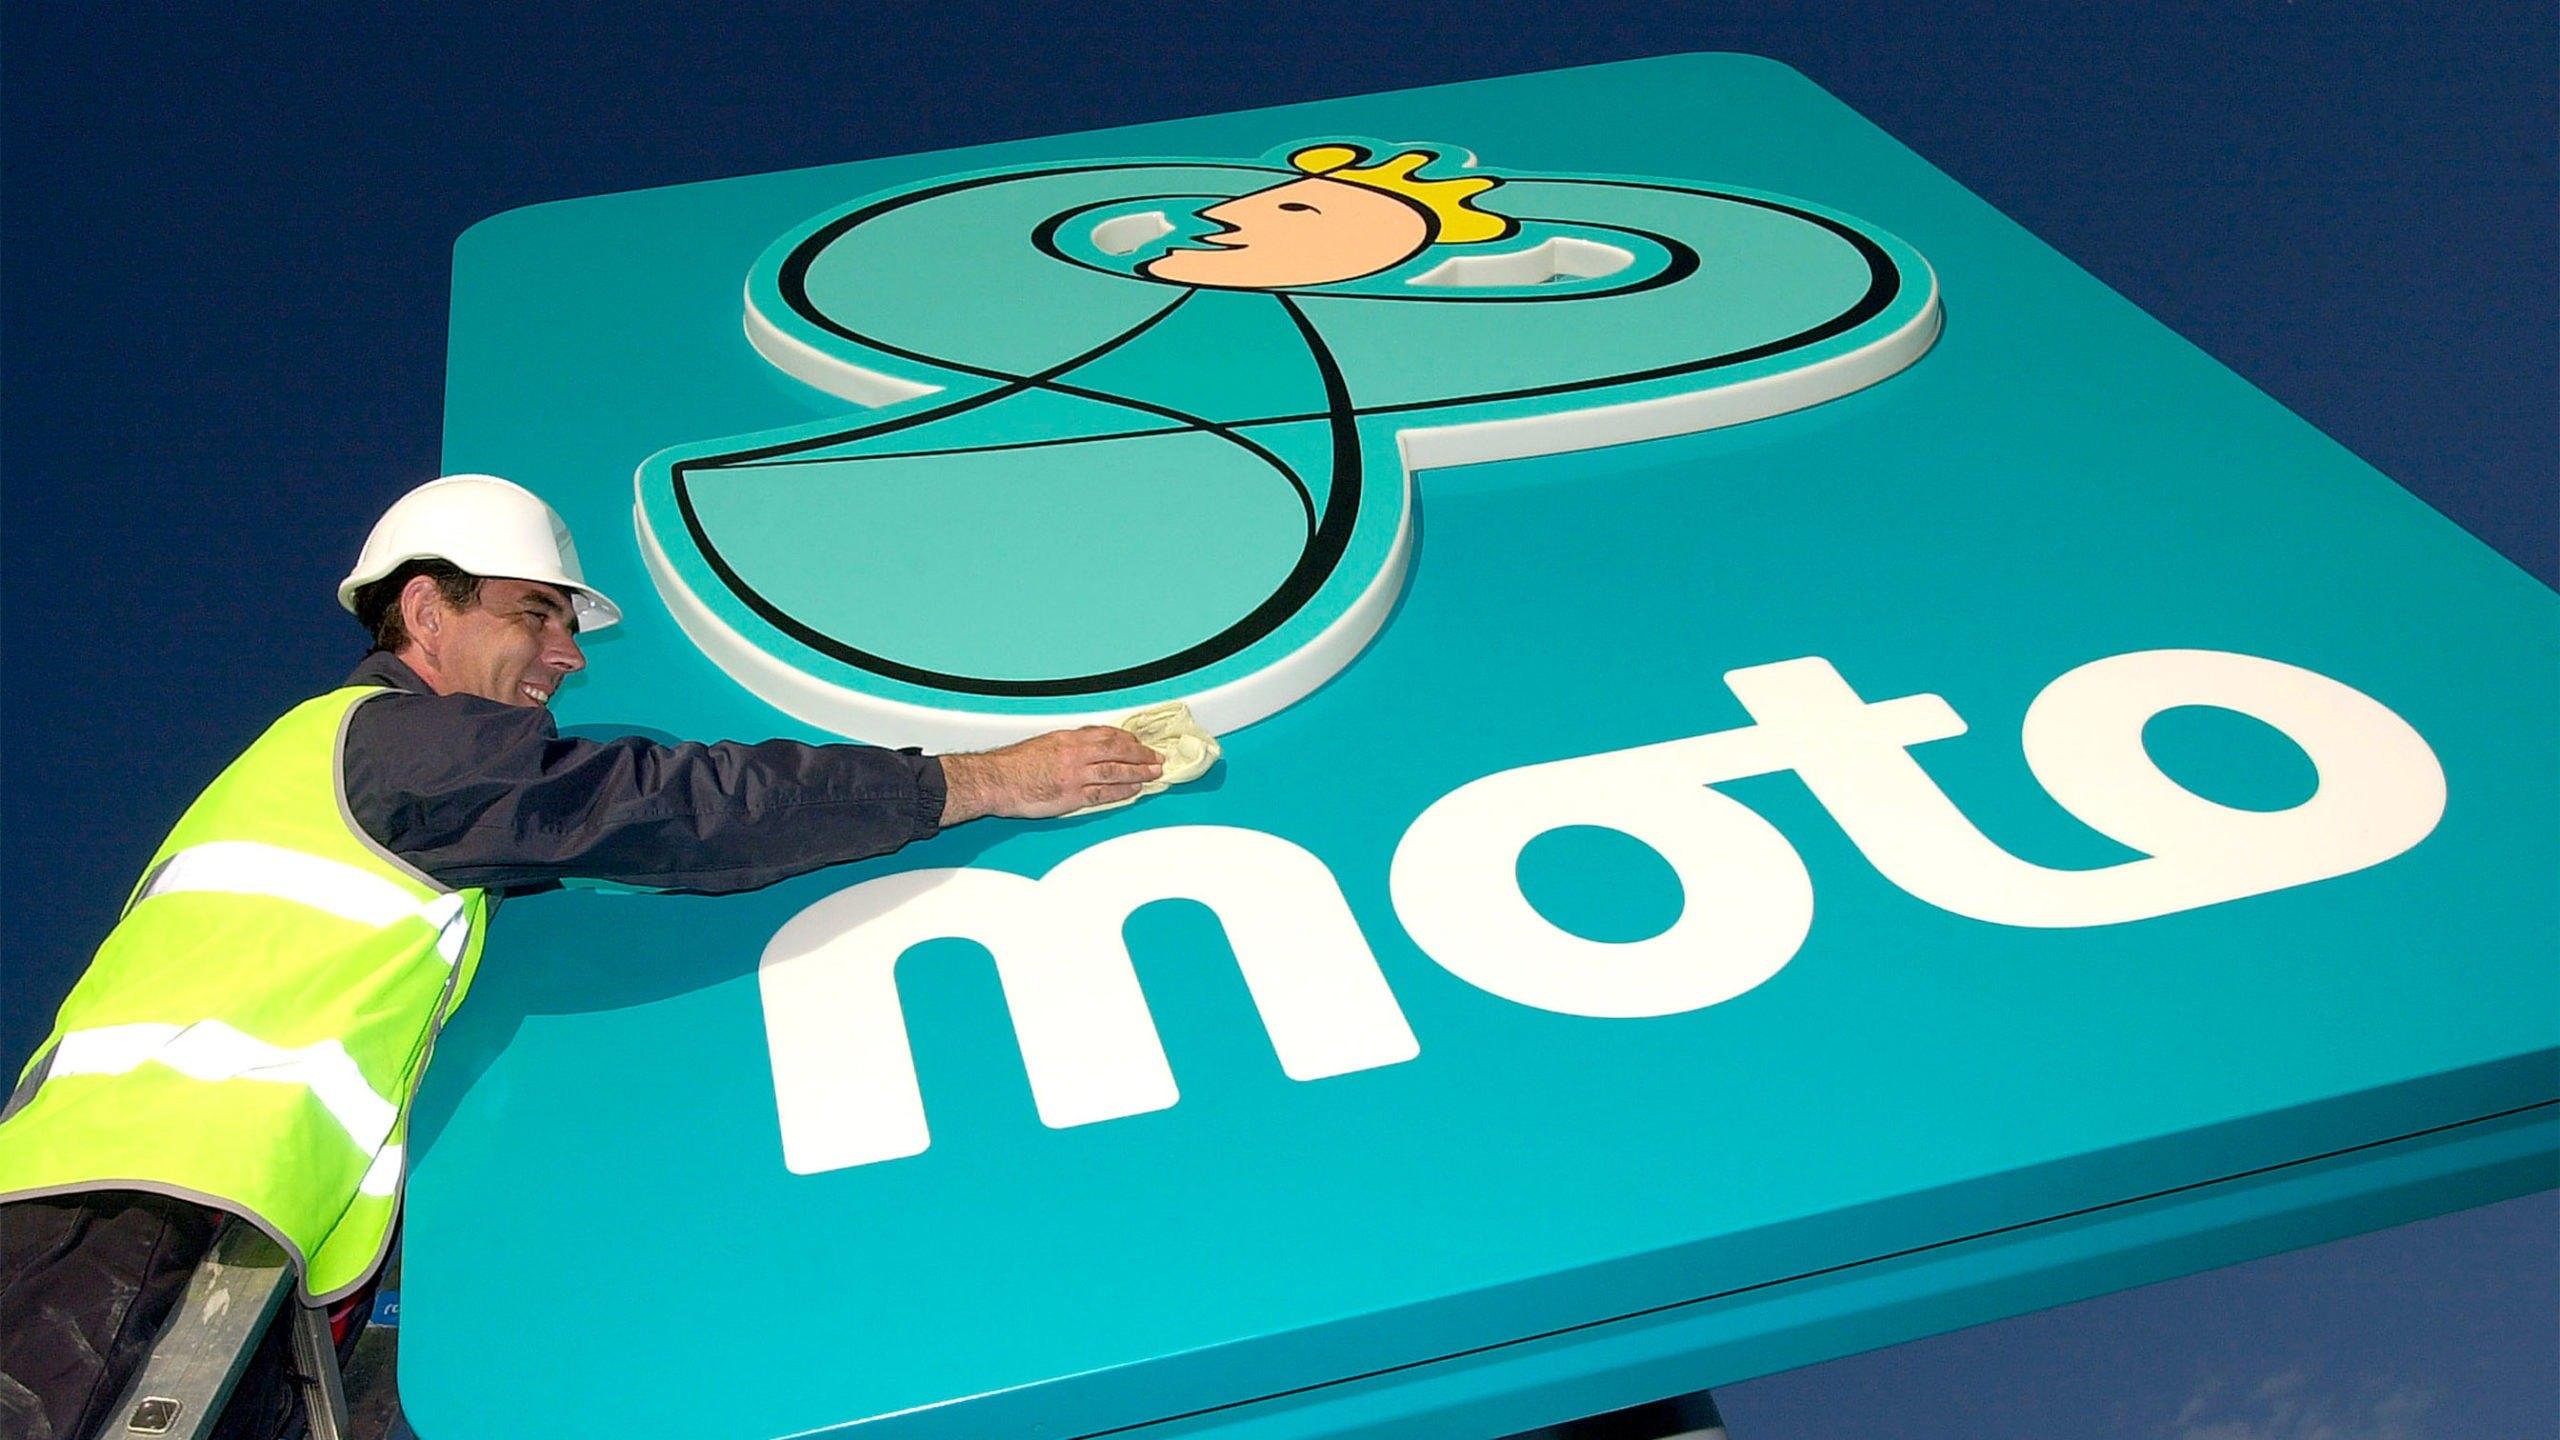 Man polishing large Moto sign